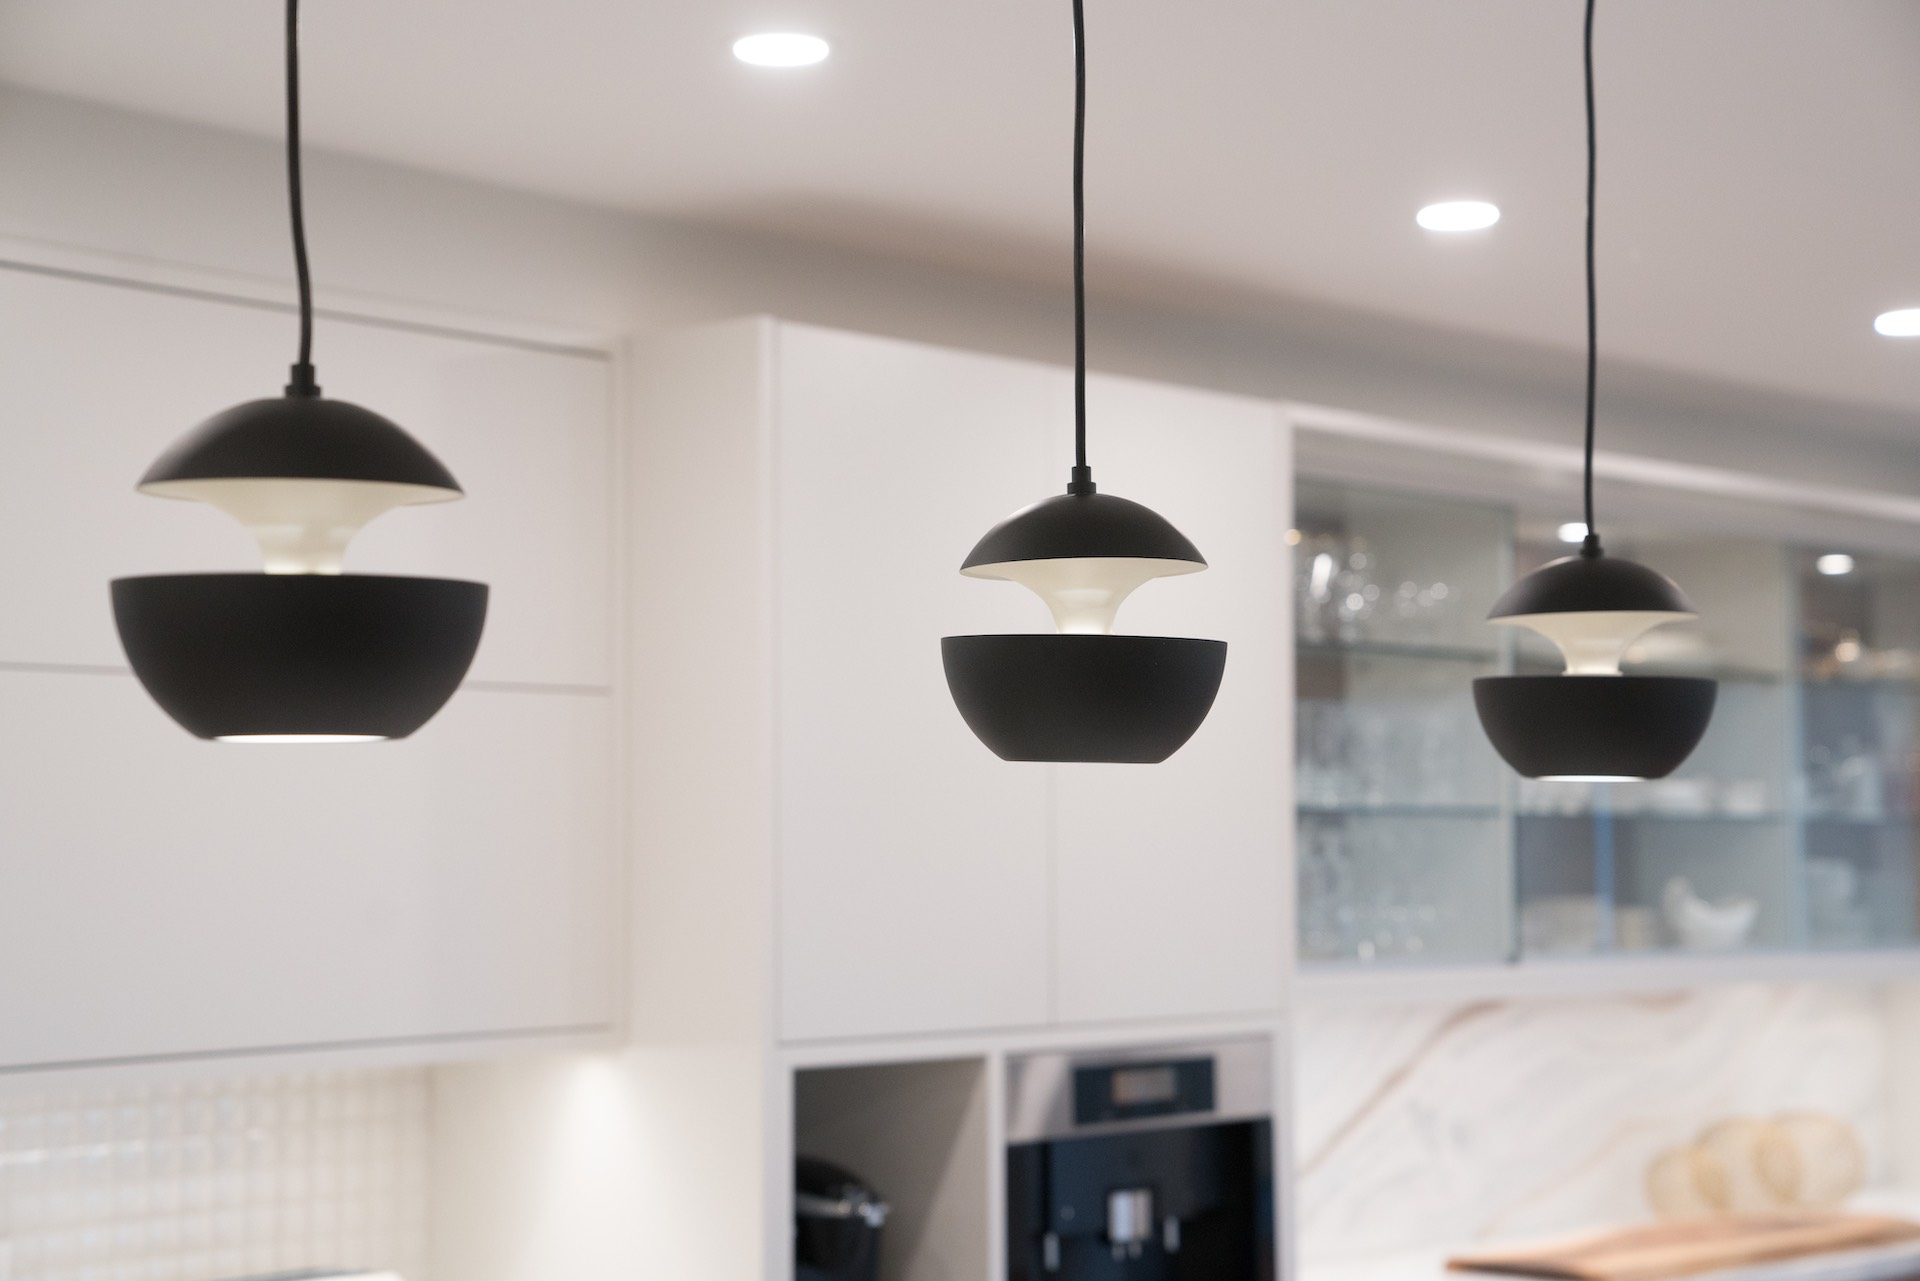 Black round hanging lights